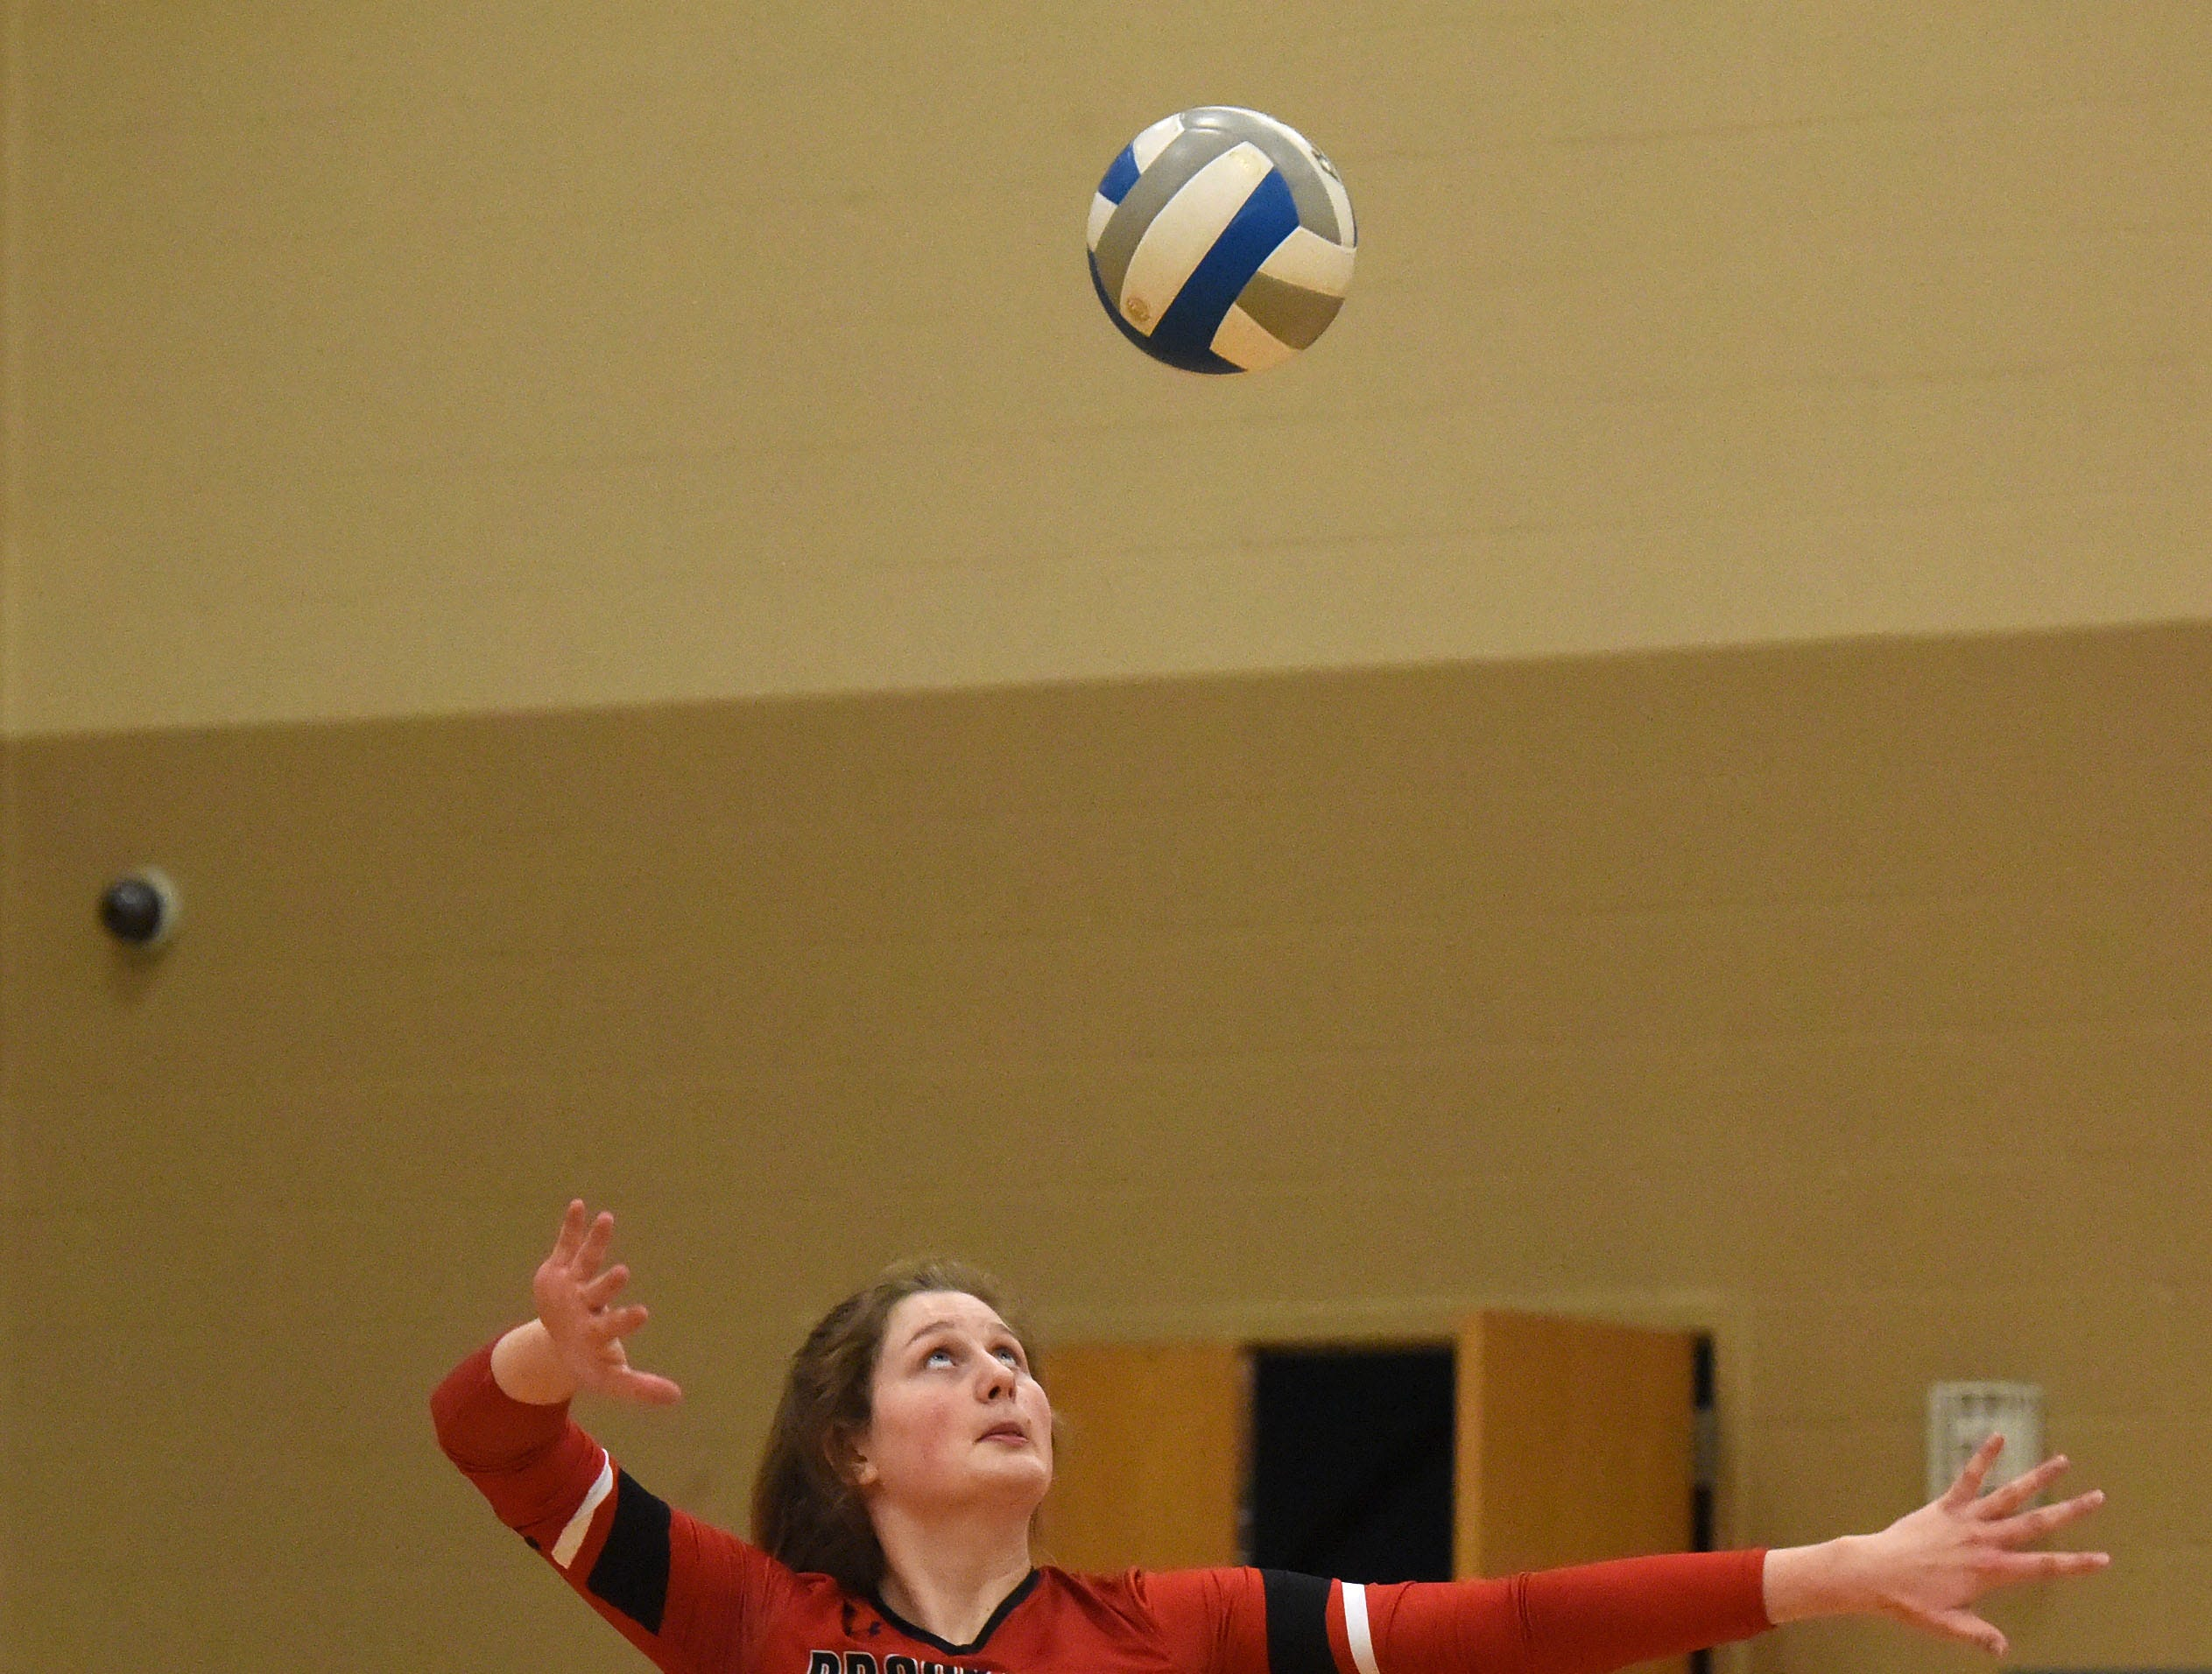 Brookings' Michaela Jewett (13) serves the ball during a match against Harrisburg Tuesday, Oct. 30, 2018 in Harrisburg, S.D.